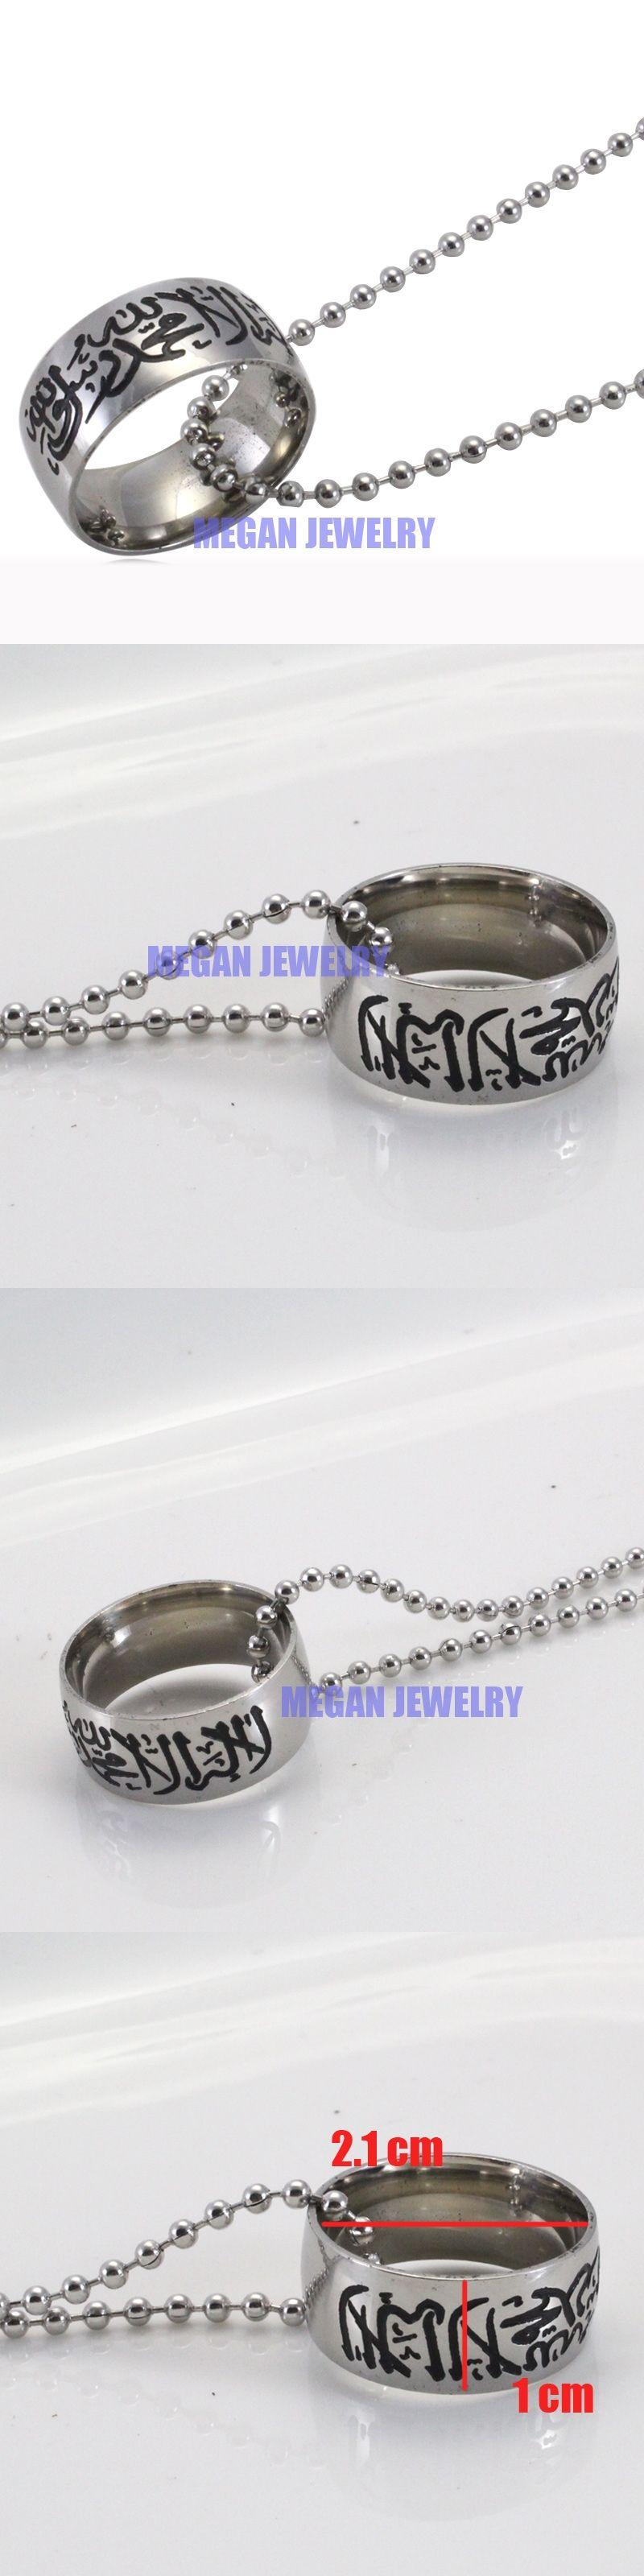 Muslim allah shahada stainless steel necklace for women men cm